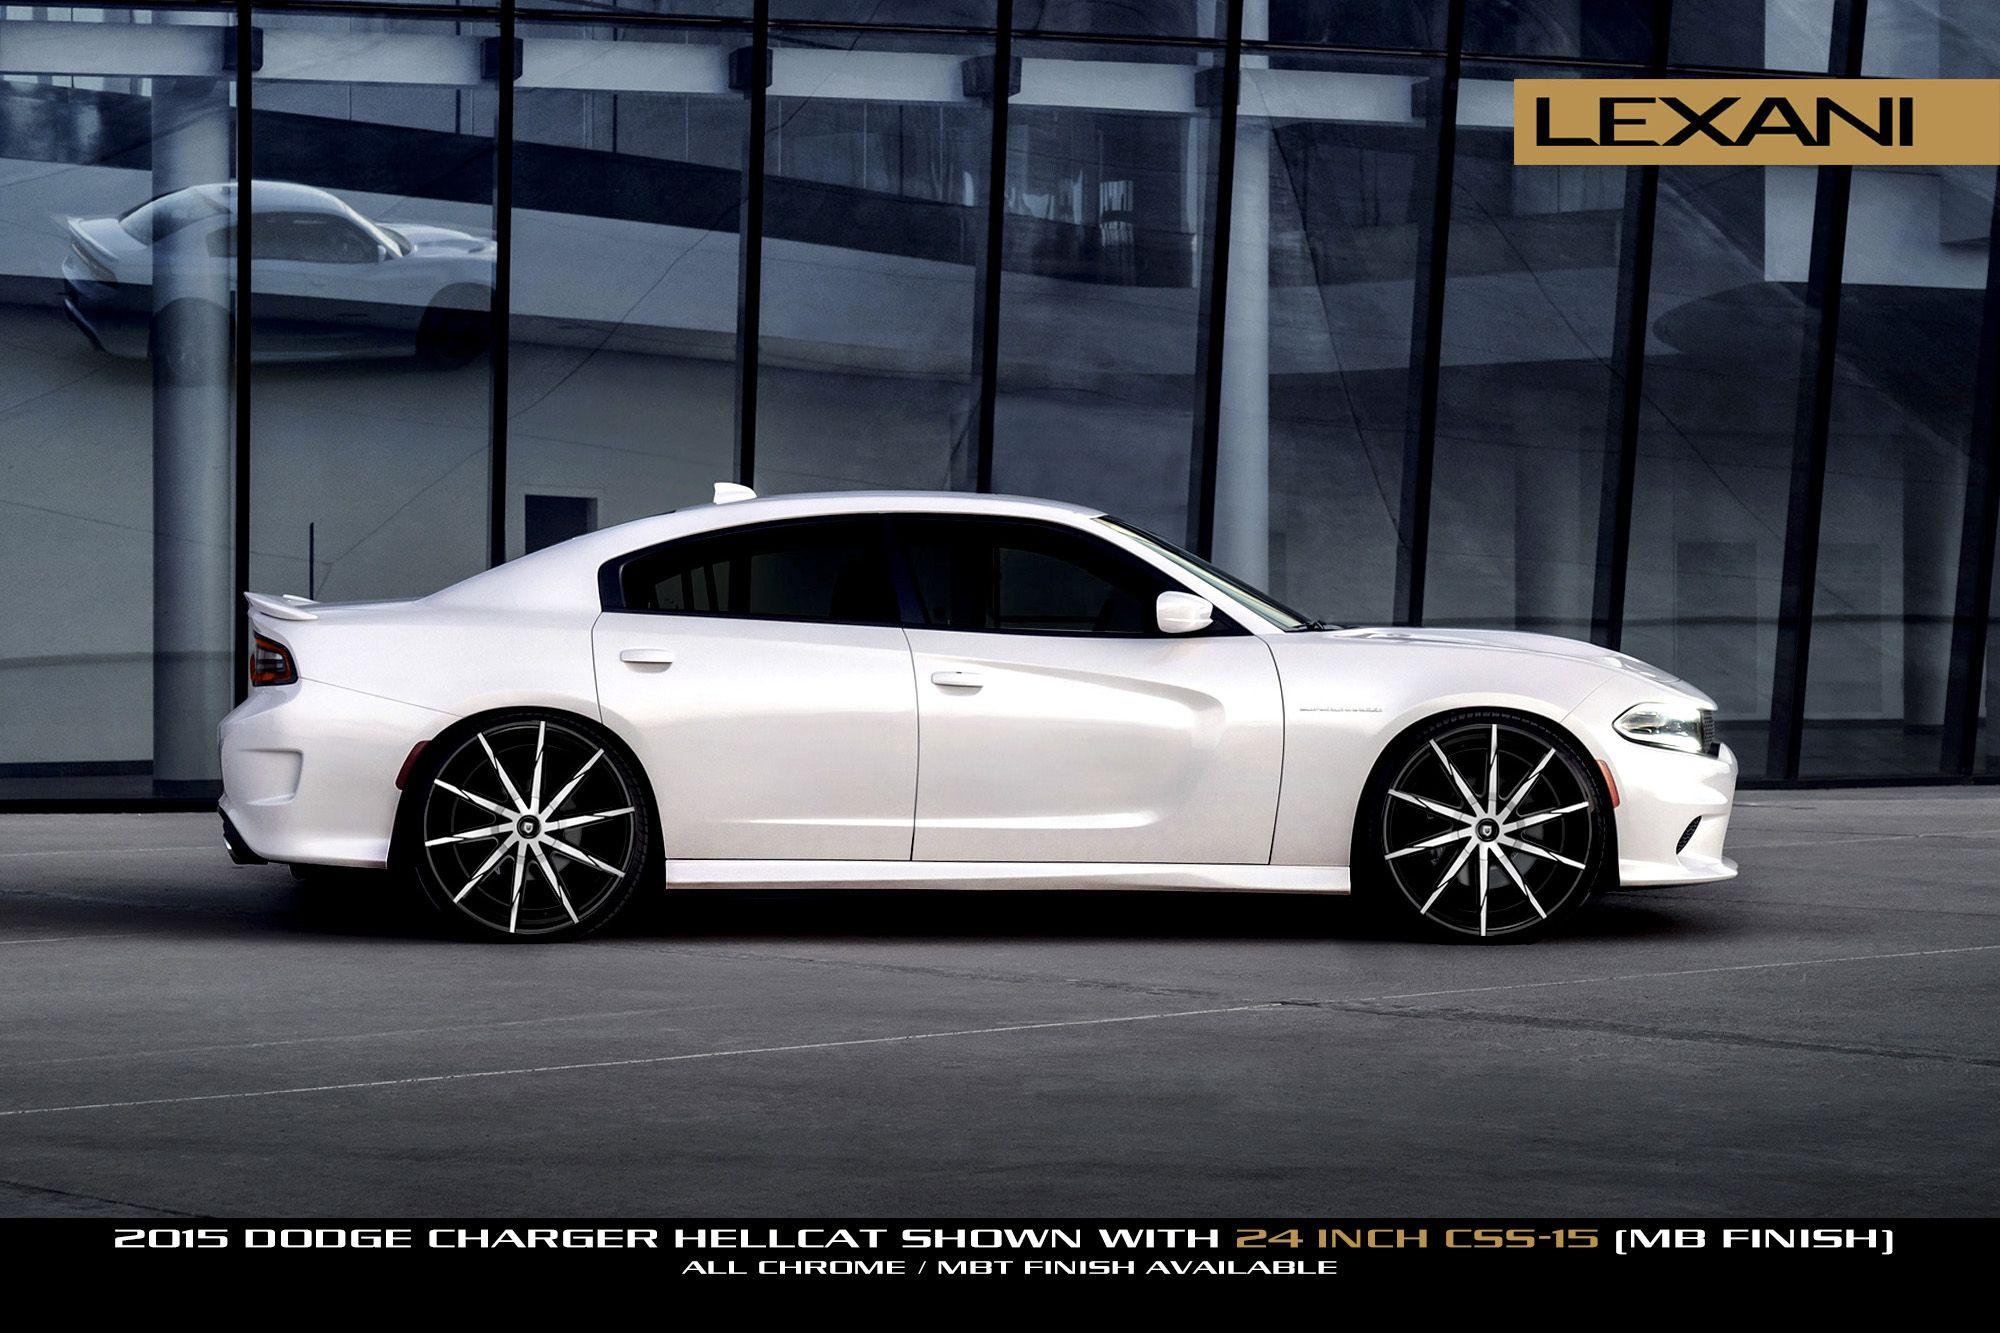 24 Lexani Wheels Css 15 Suv In Gloss Black Machined On A 2015 Dodge Charger Hellcat 2015 Dodge Charger Hellcat Dodge Charger Hellcat Custom Wheels And Tires